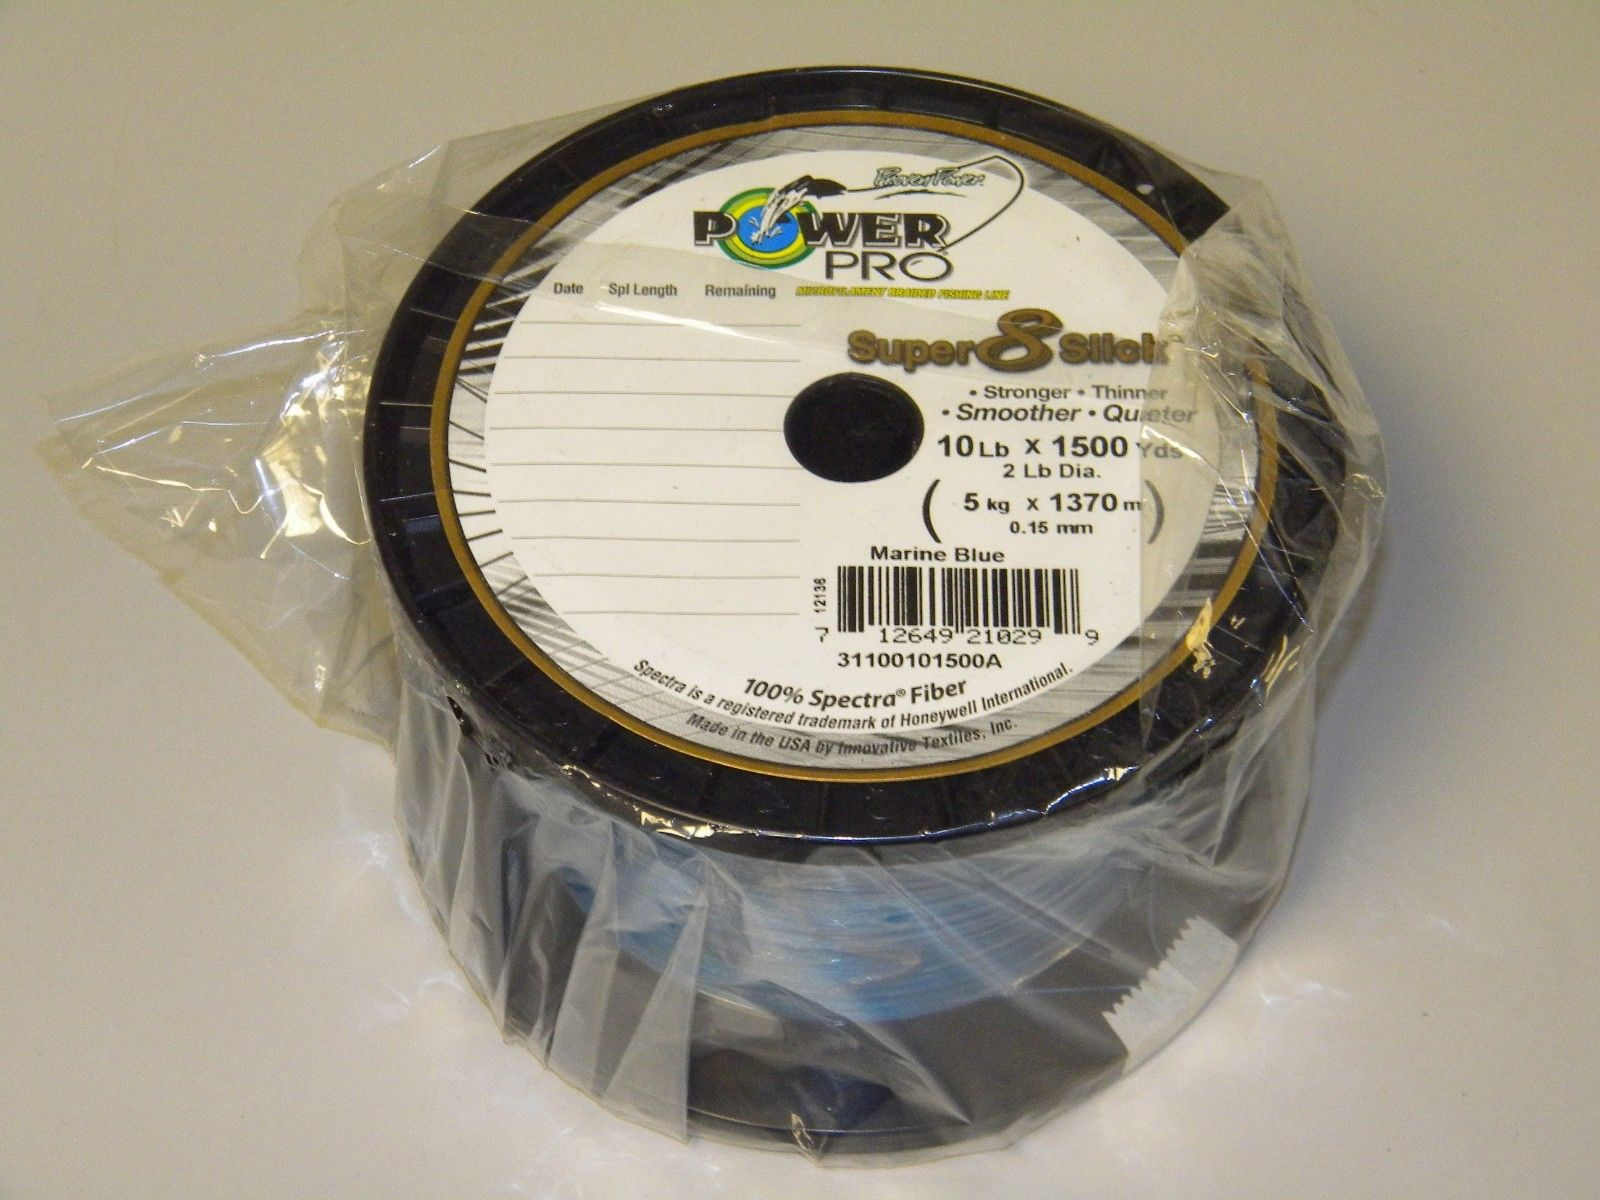 Power pro usa super slick 8 braid fishing line 10lb 1500yd for Power pro braided fishing line